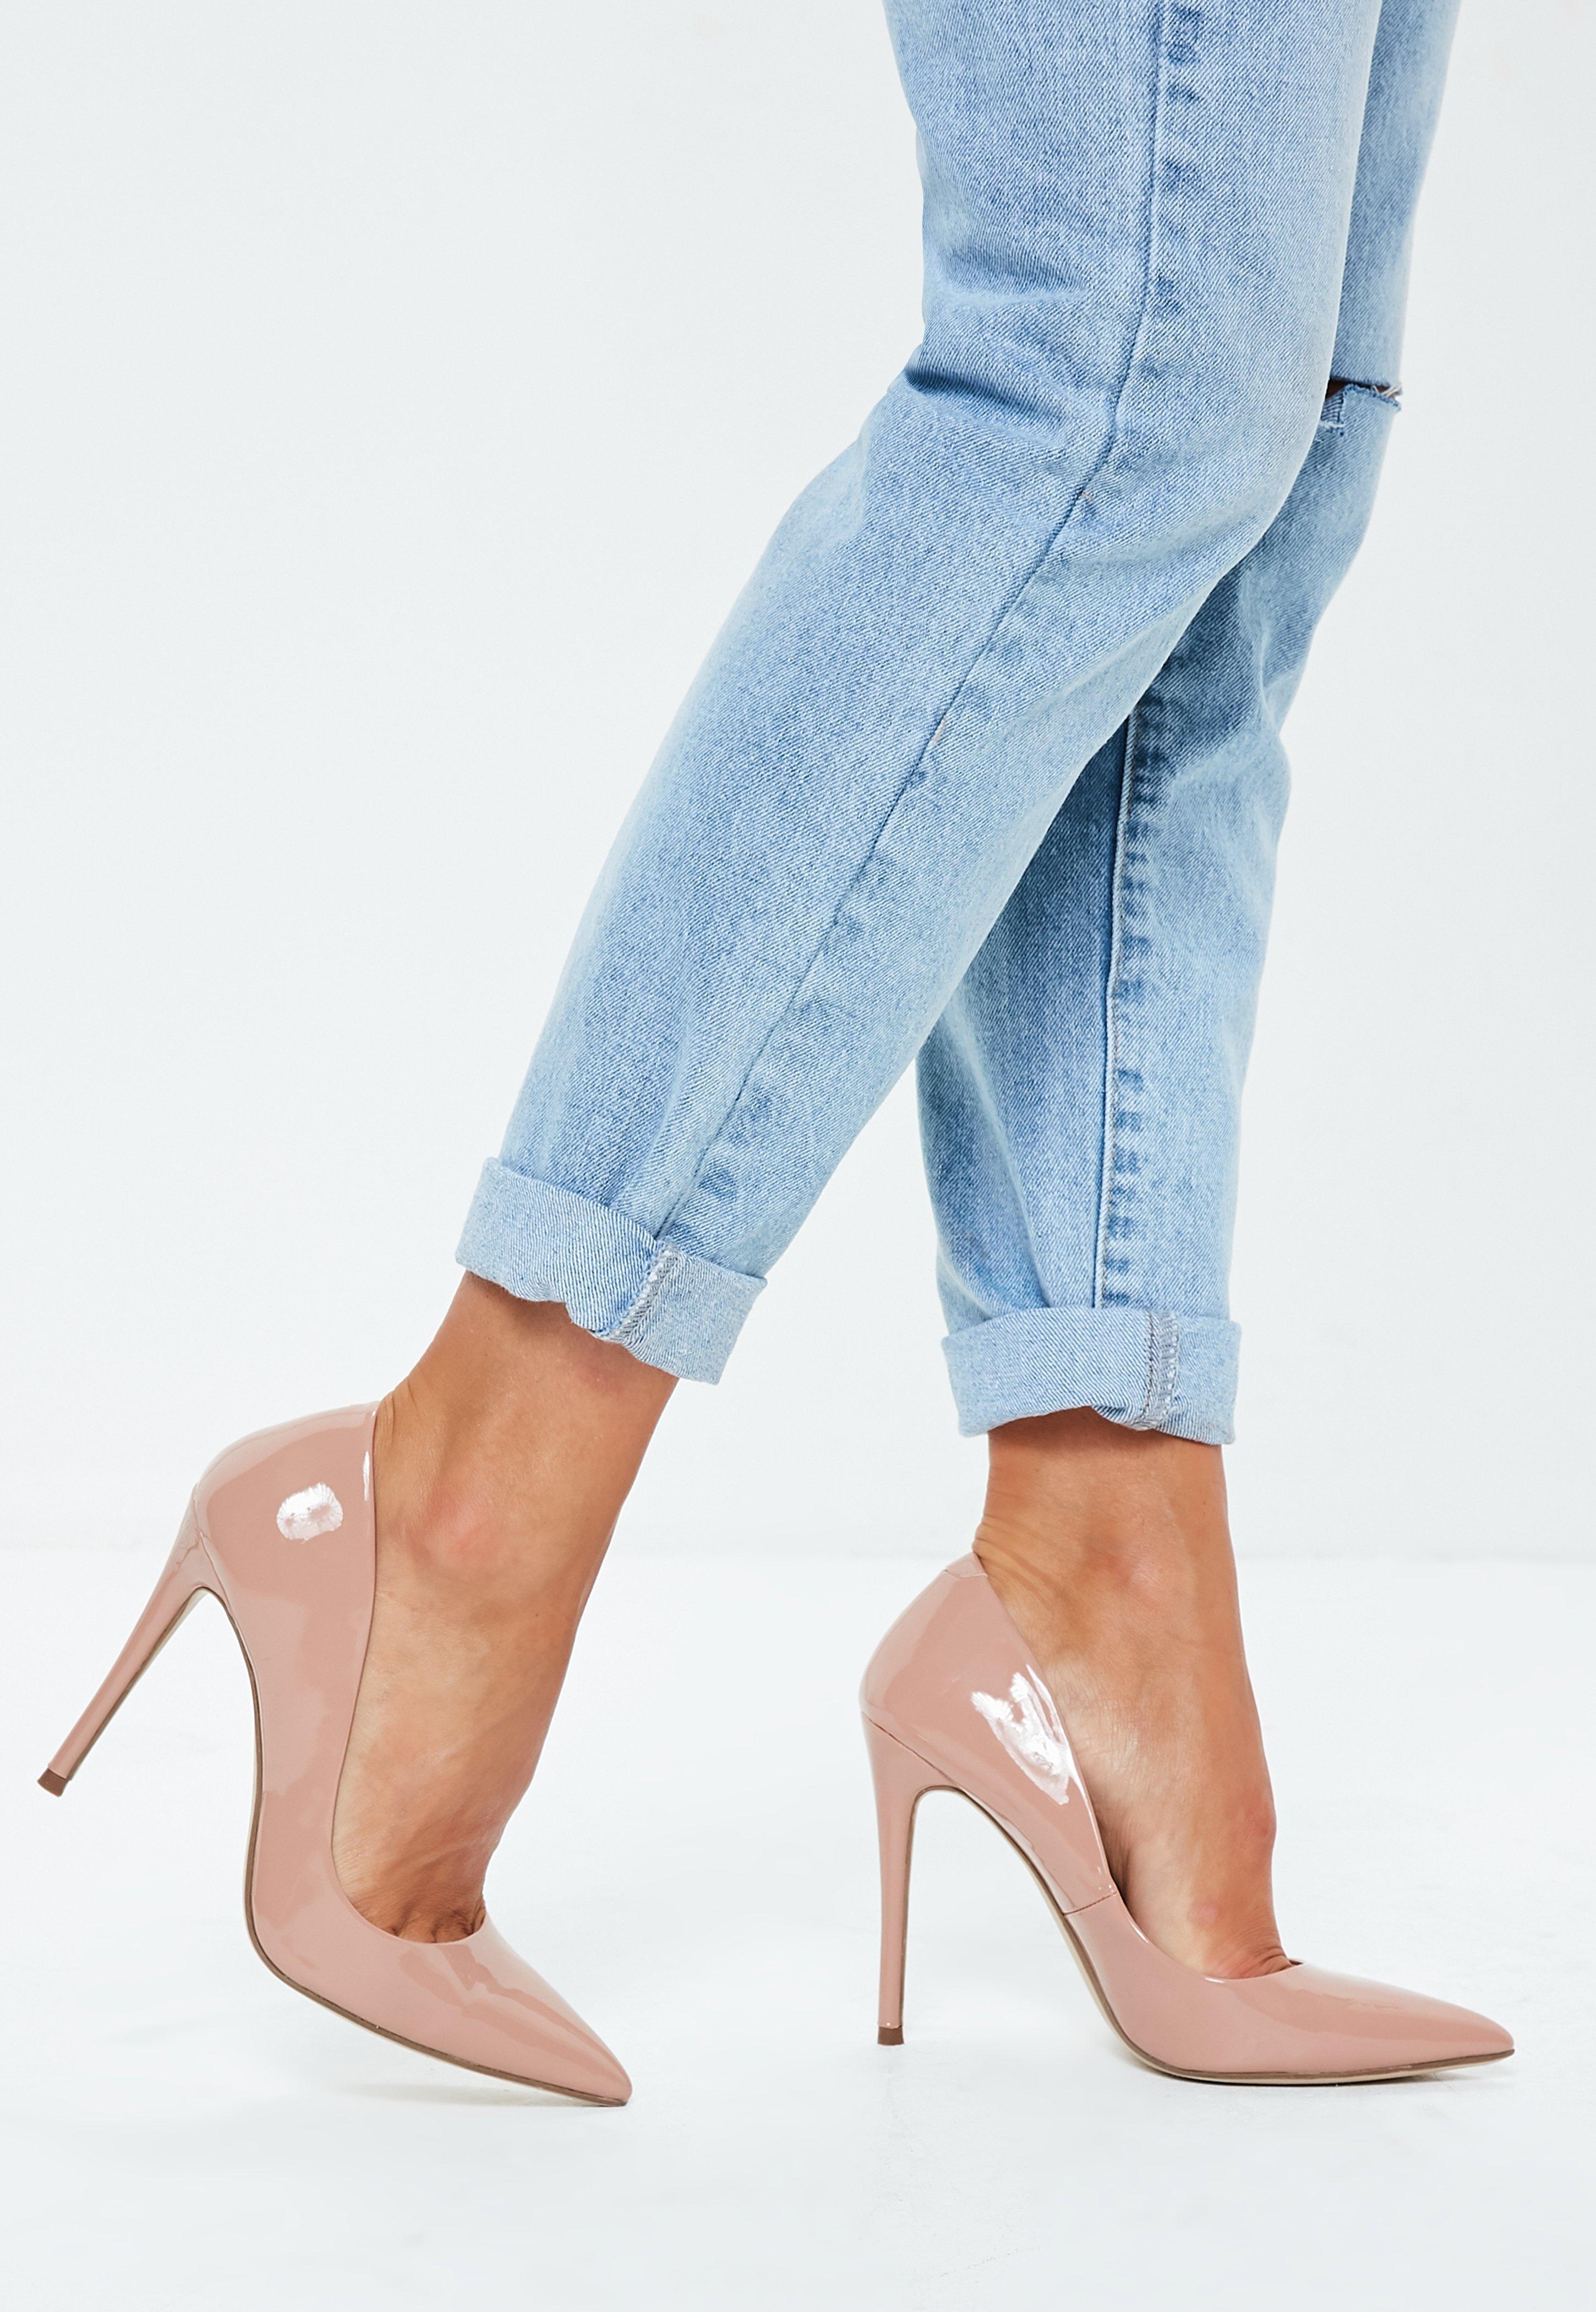 0e80a66f3531 Nude Patent Court Shoes